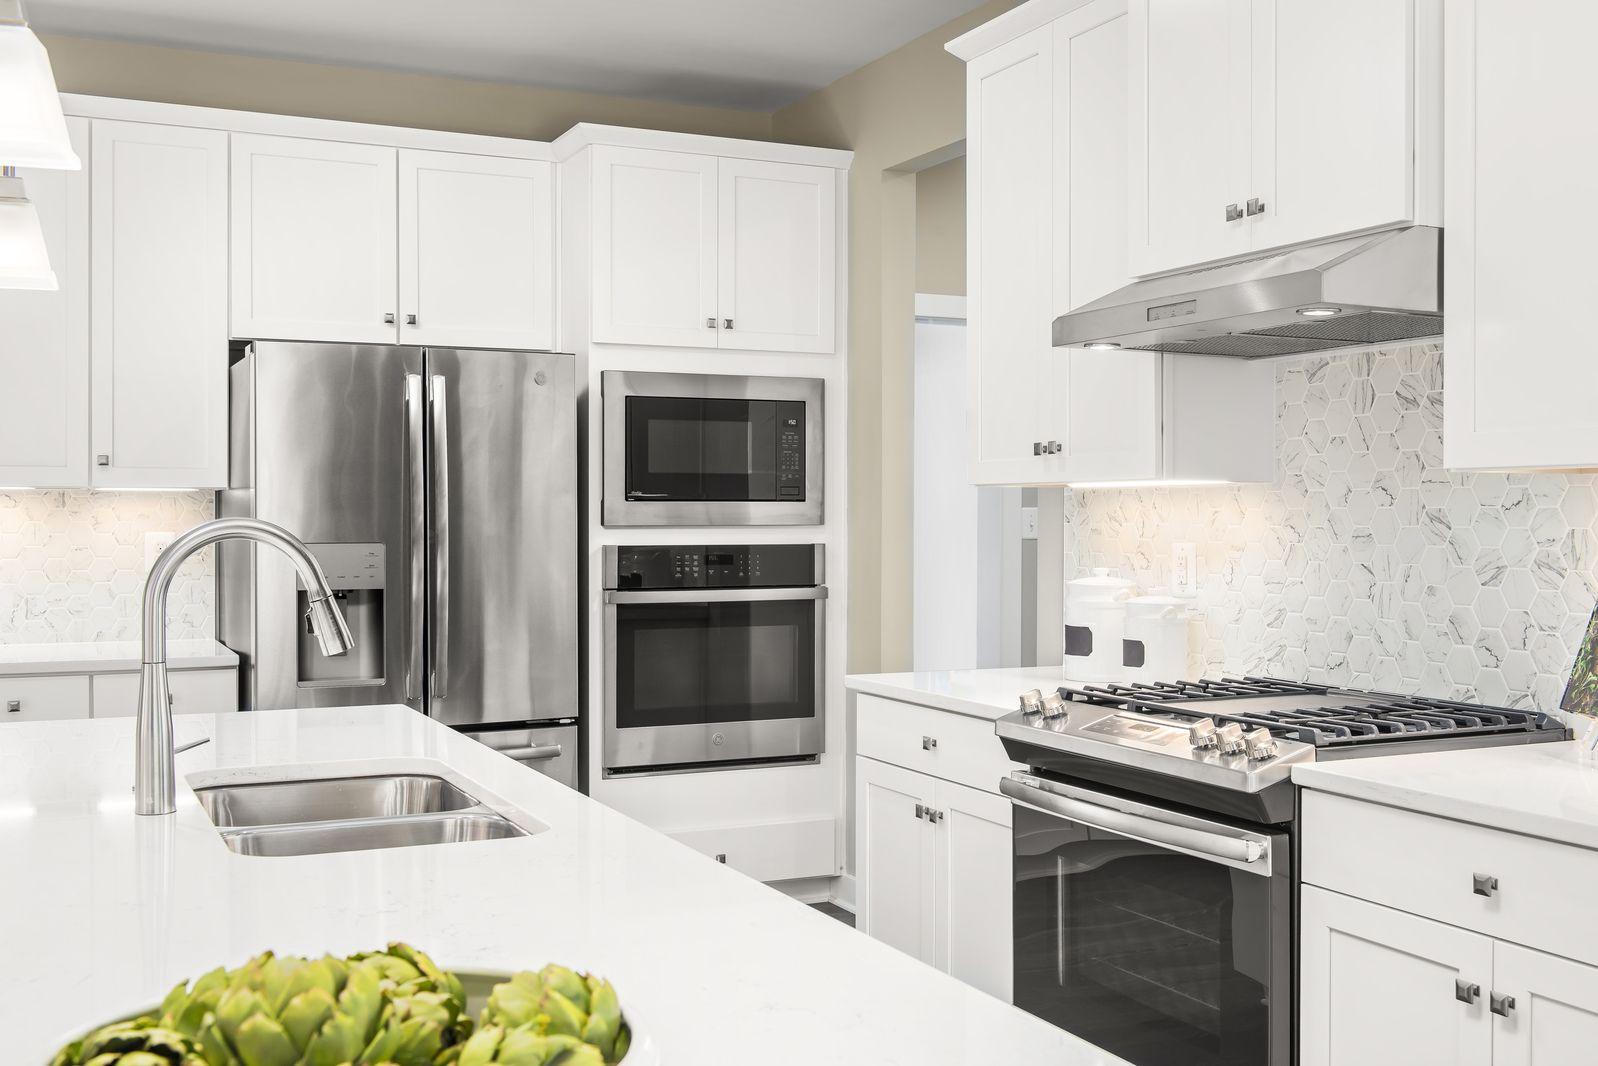 Kitchen featured in the Seneca By Ryan Homes in Cincinnati, OH